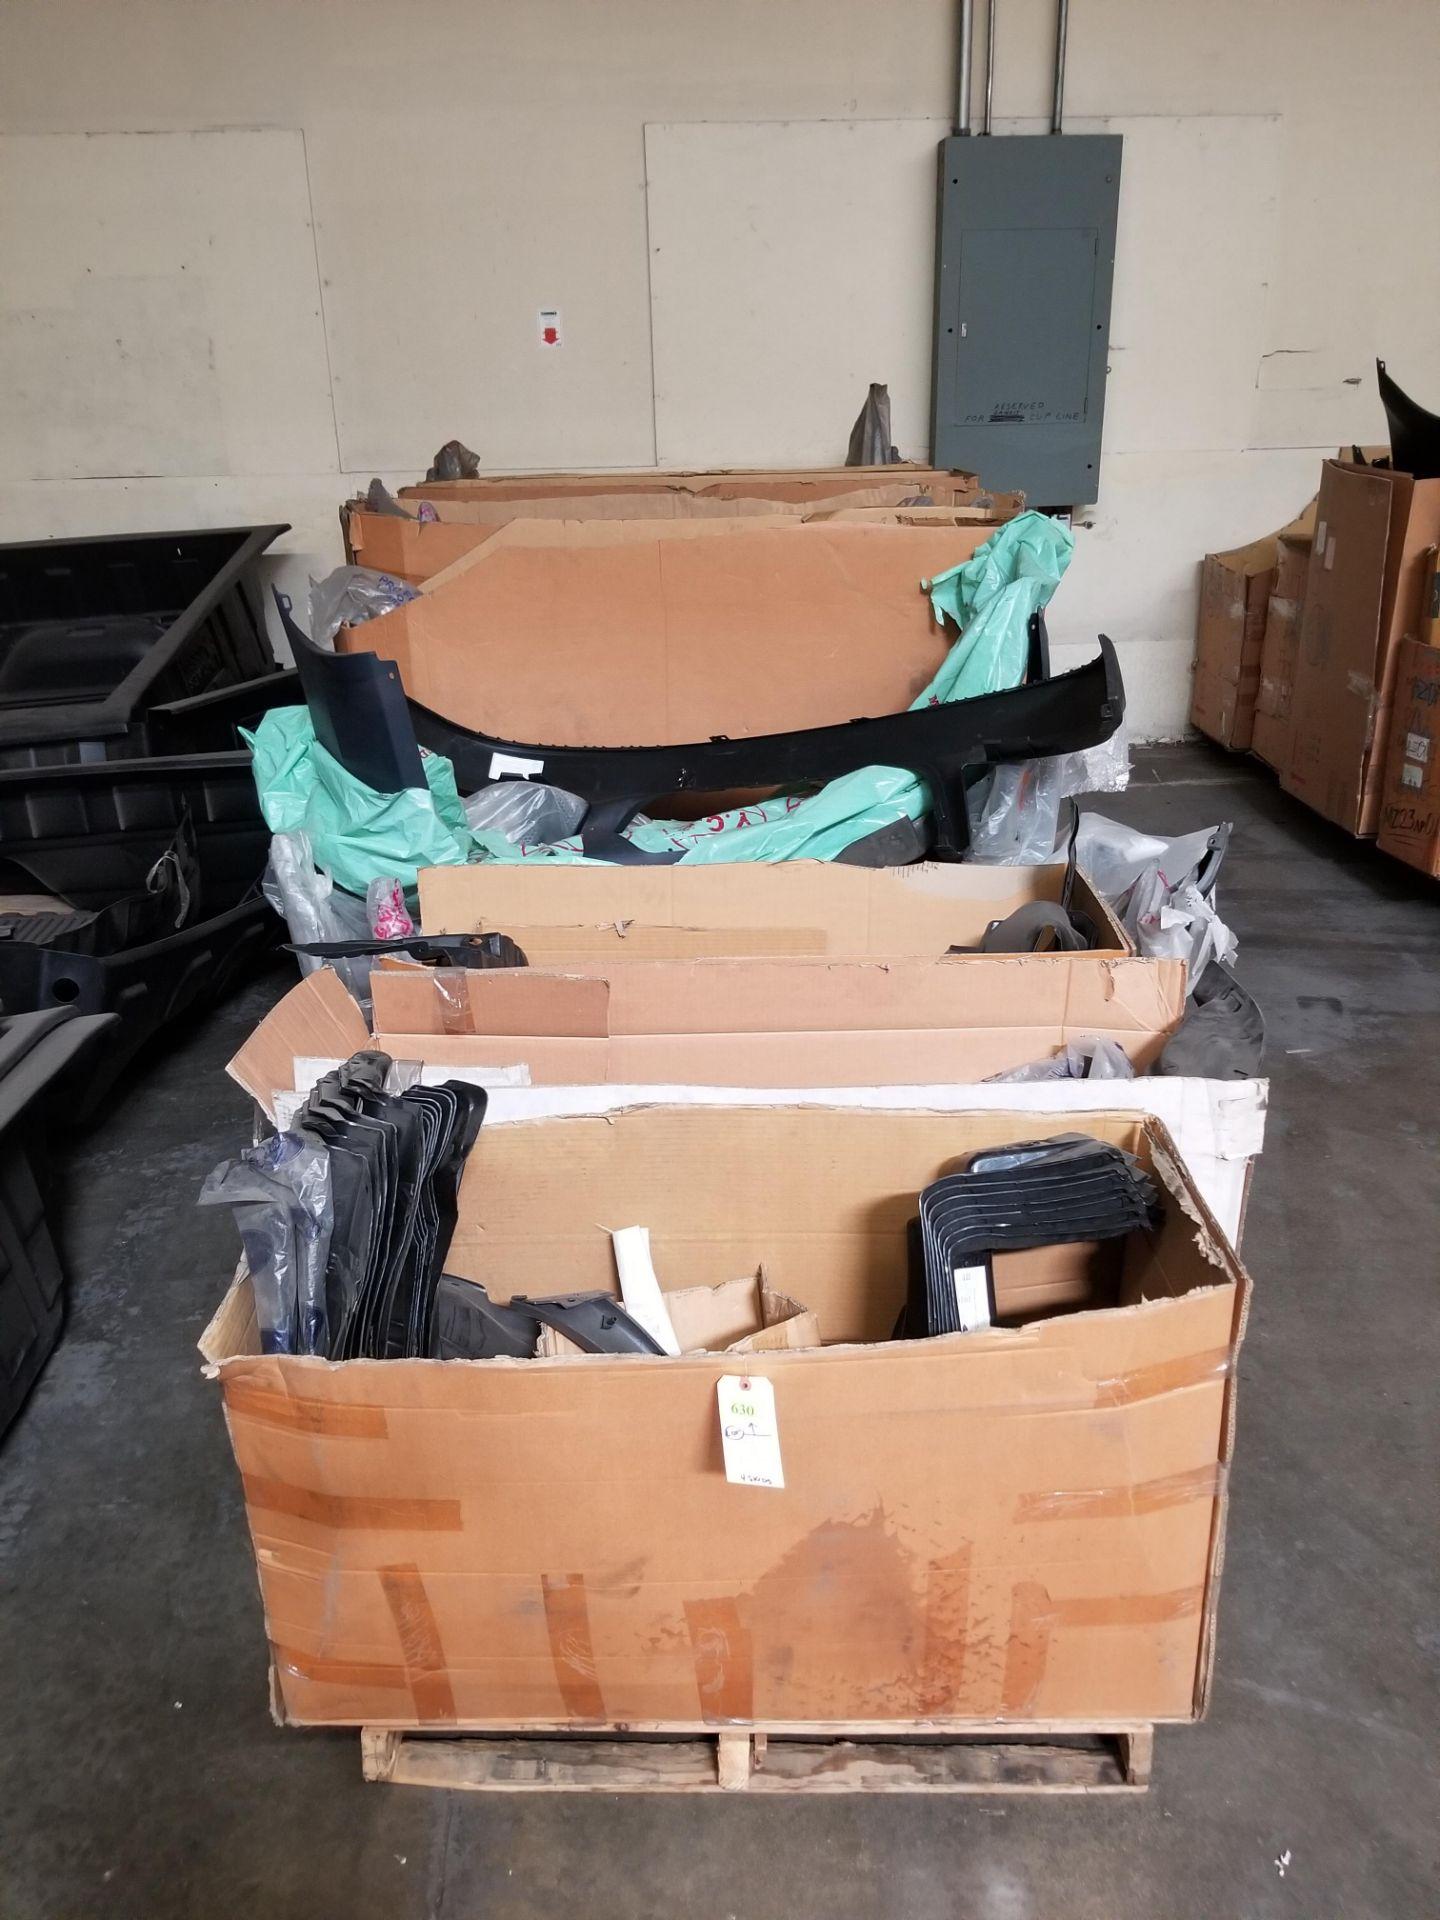 ASST BUMPERS/ SPLASH SHIELDS 4 PALLETS